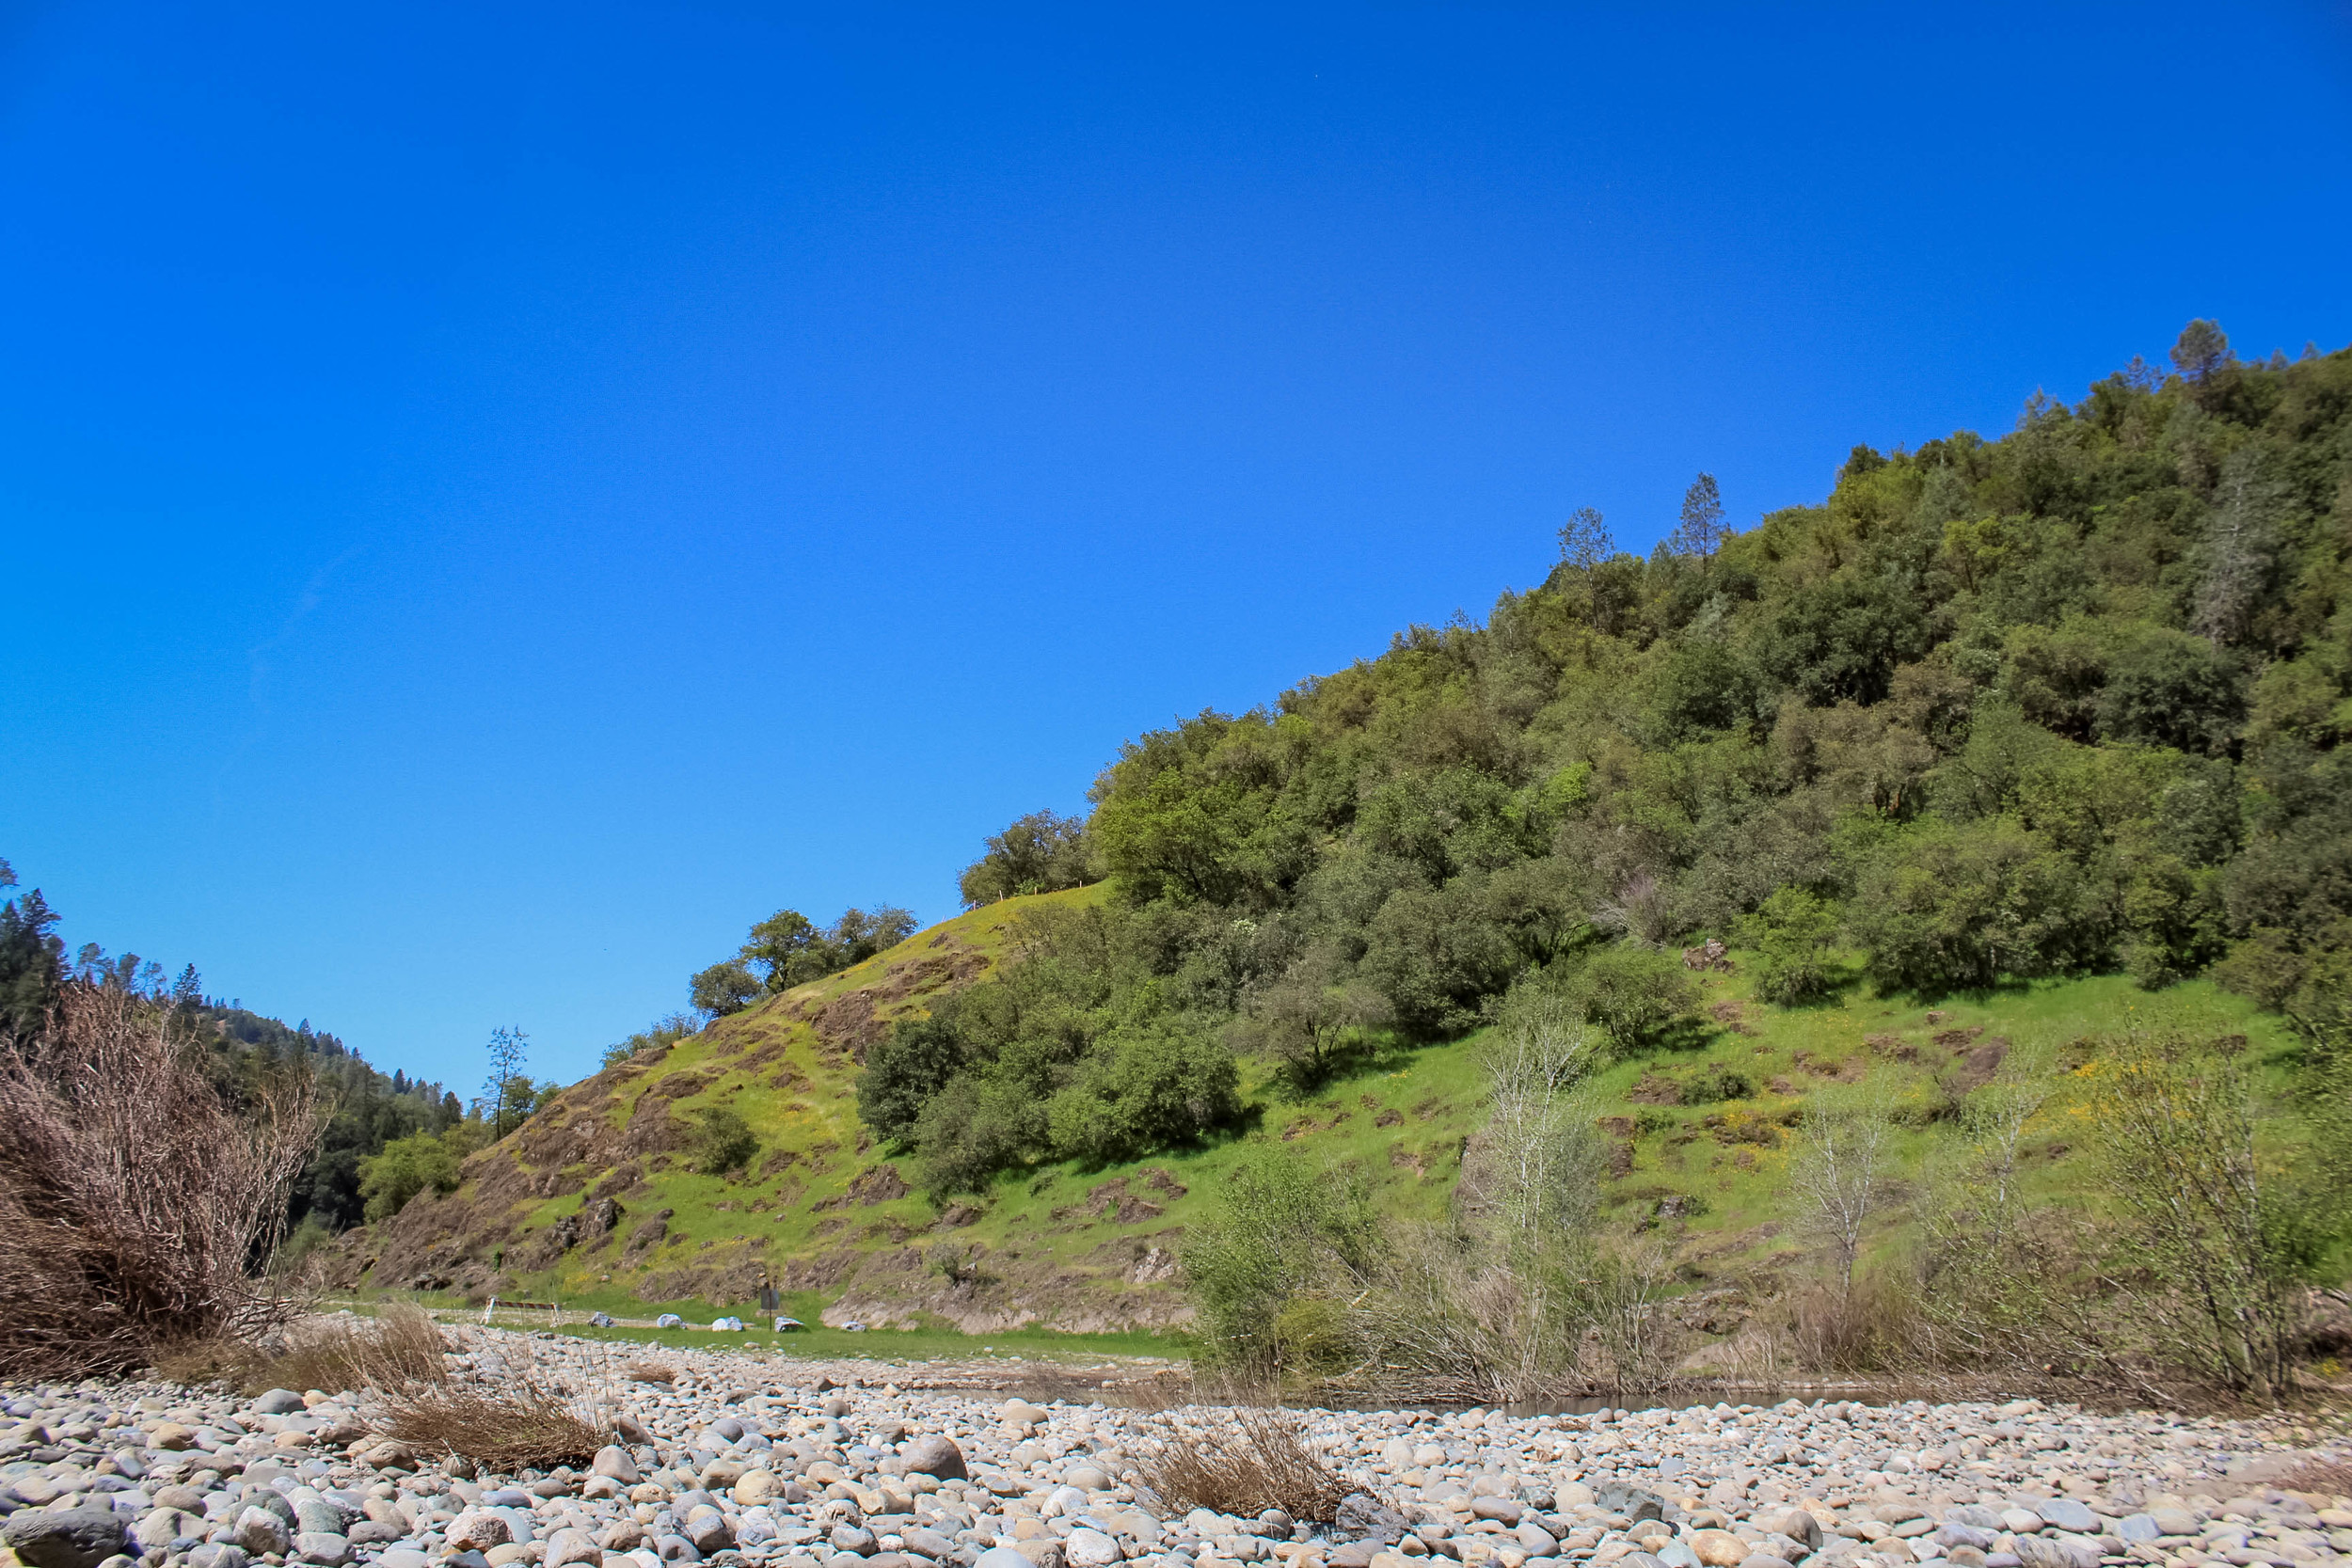 Landscape from the American River Confluence Trail in Auburn, CA. #visitauburnca